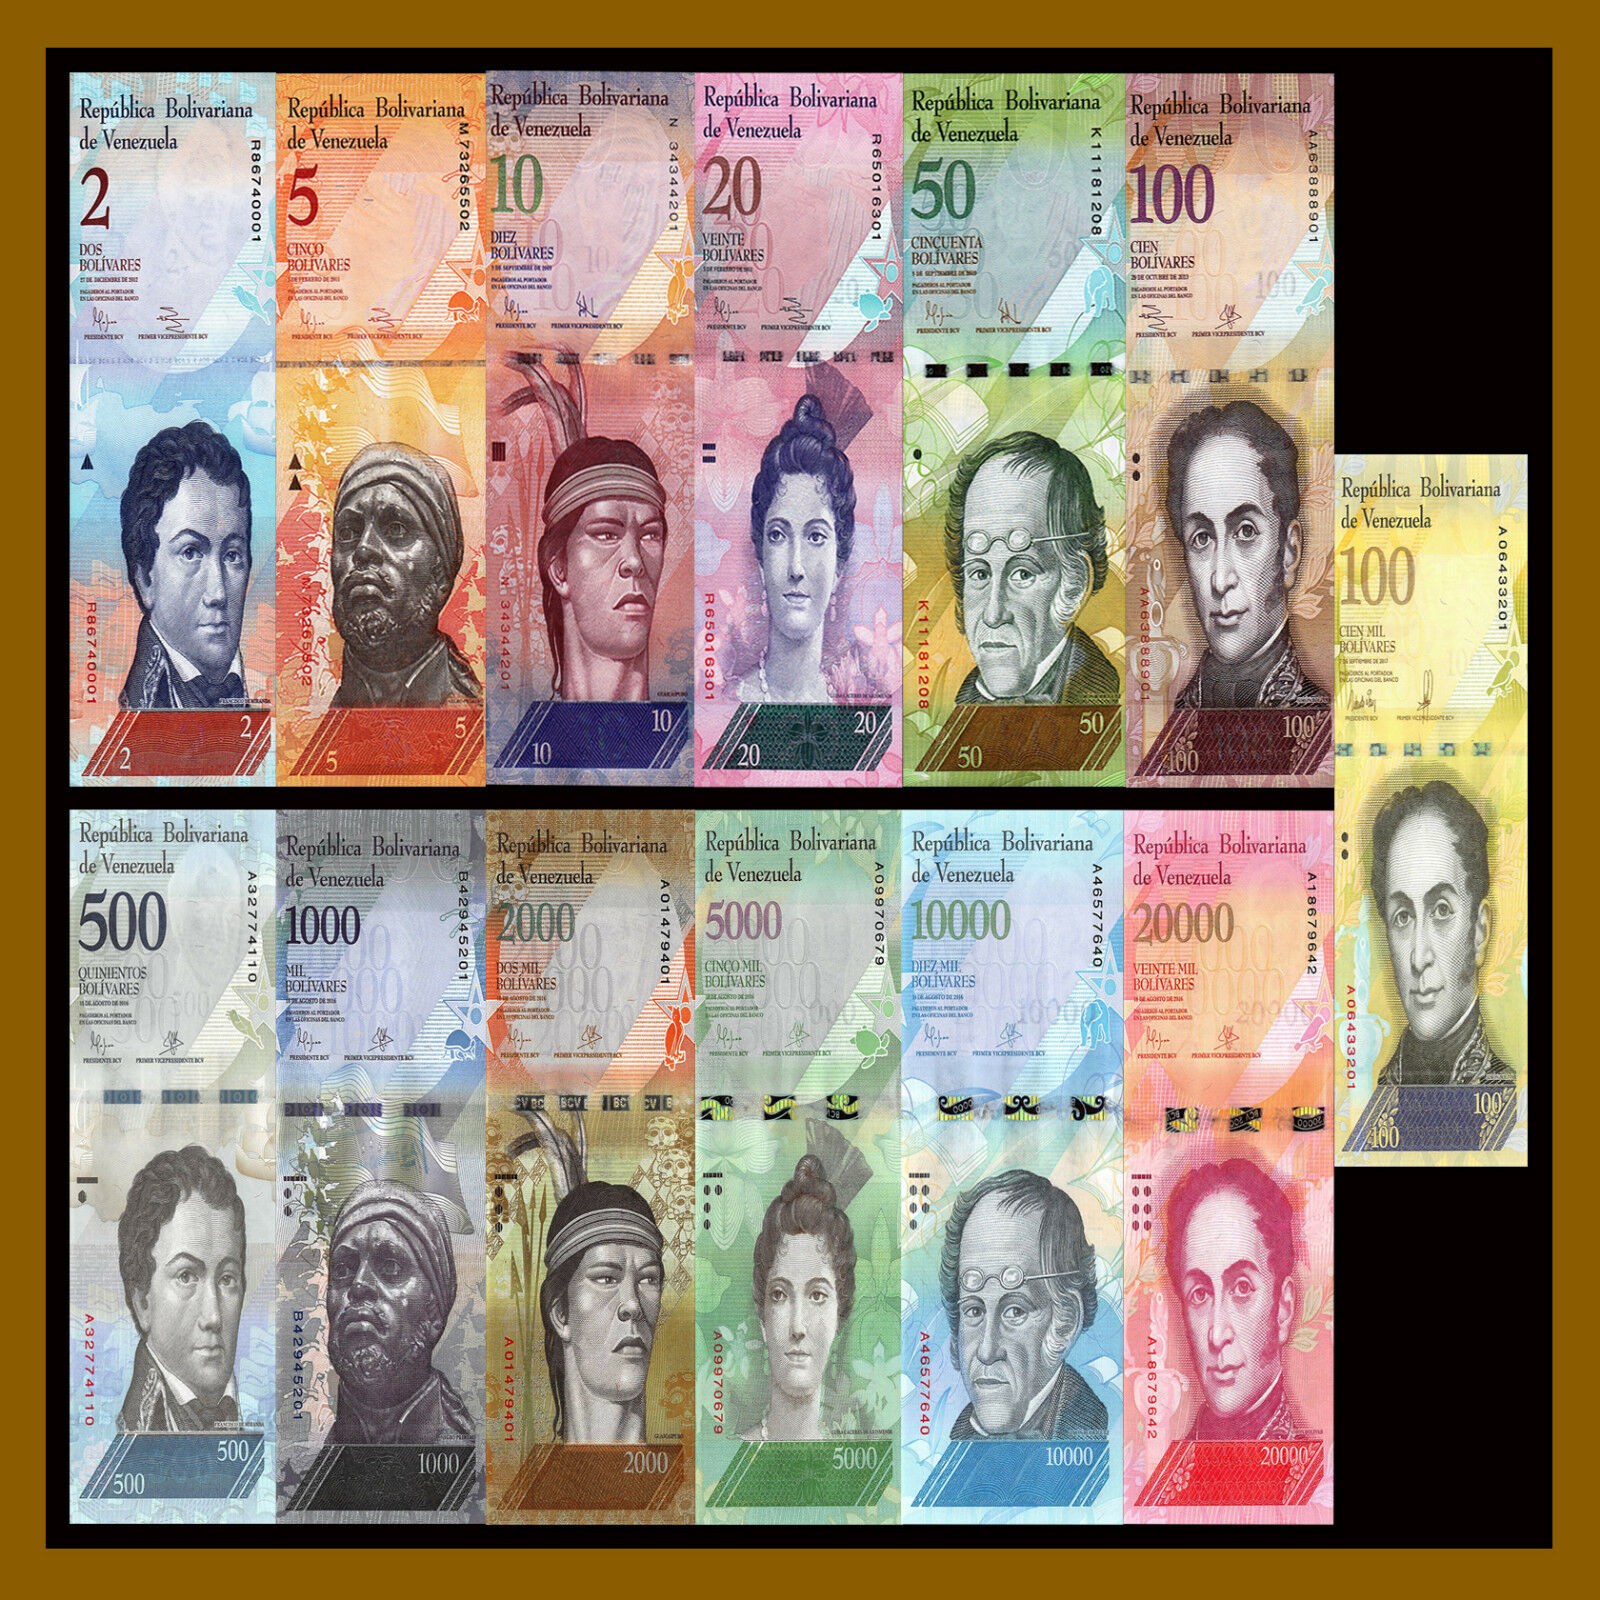 Venezuela 2 - 100000 (100,000) Bolivares (13 Pieces Pcs Full Set), 2007-2017 Unc